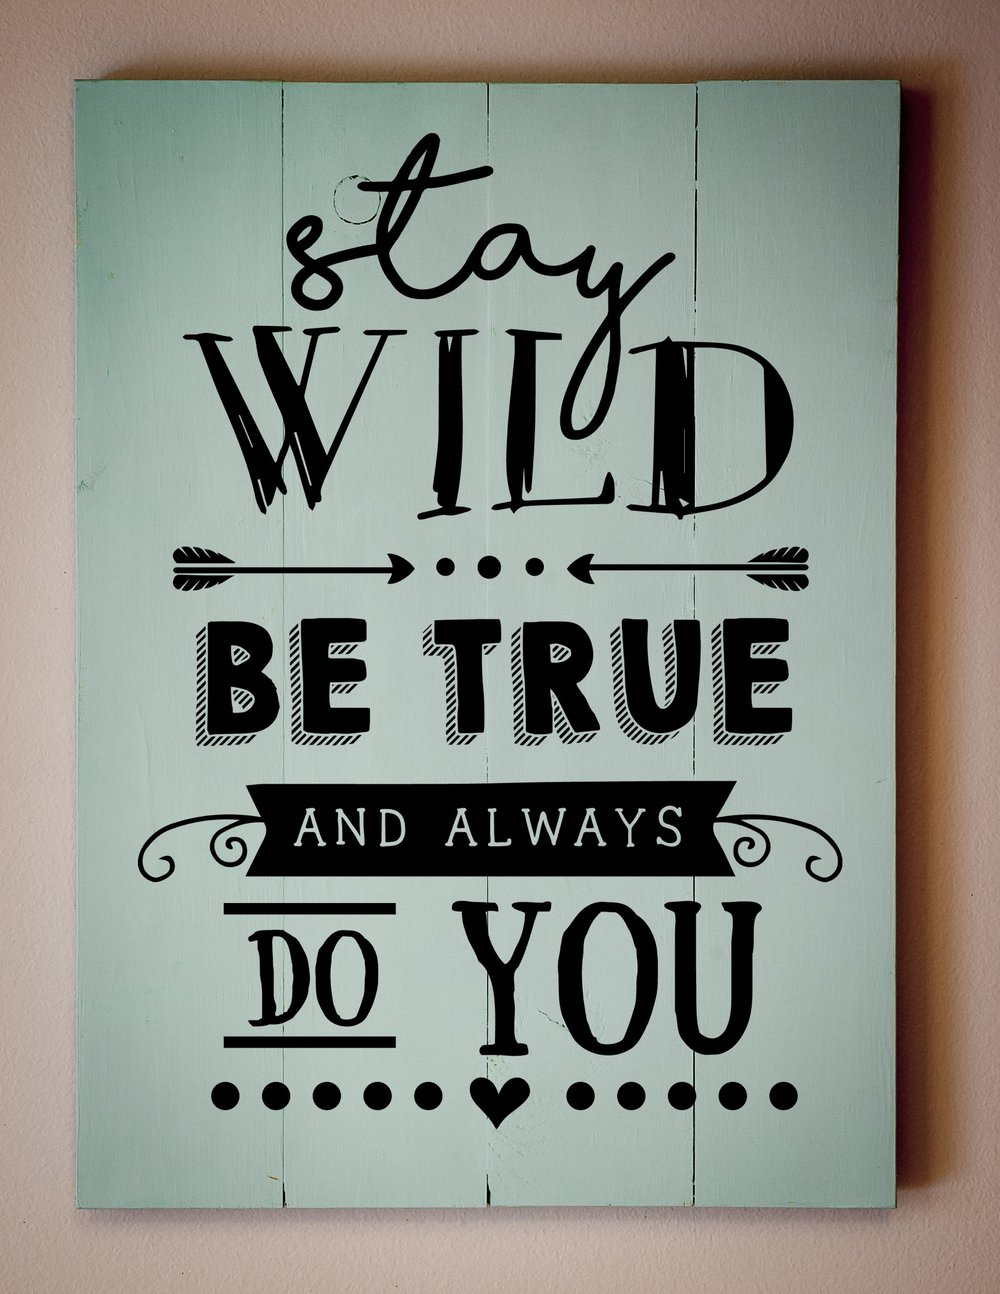 Stay wild be true..